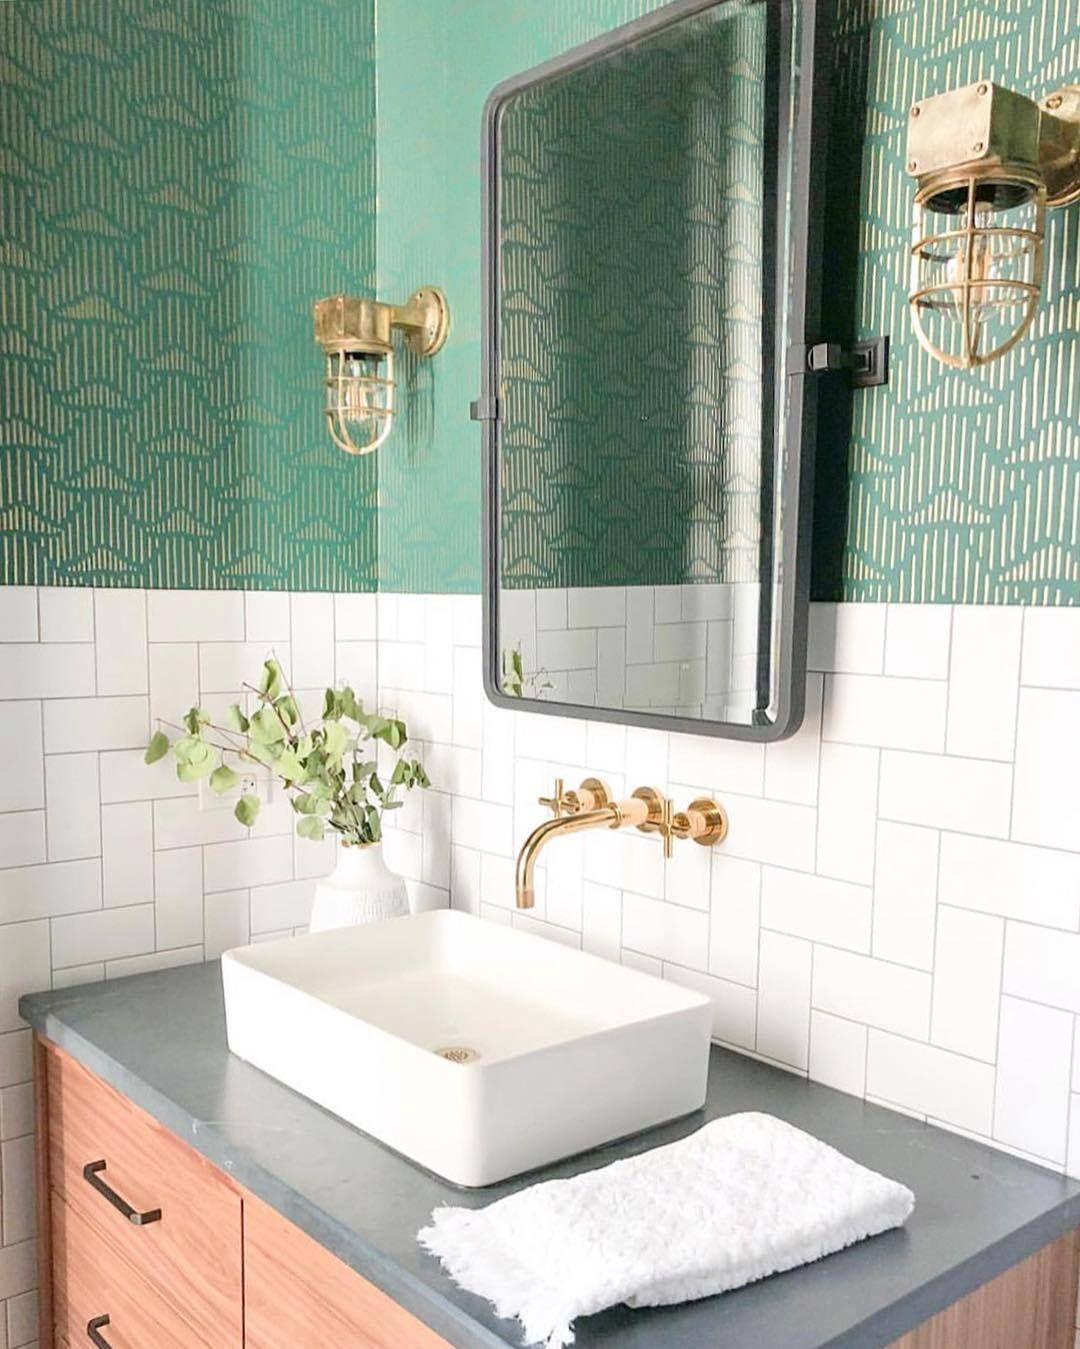 Pattern Stories Rustic Bathroom Decor Green Bathroom Bathroom Decor Green bathroom decorating ideas